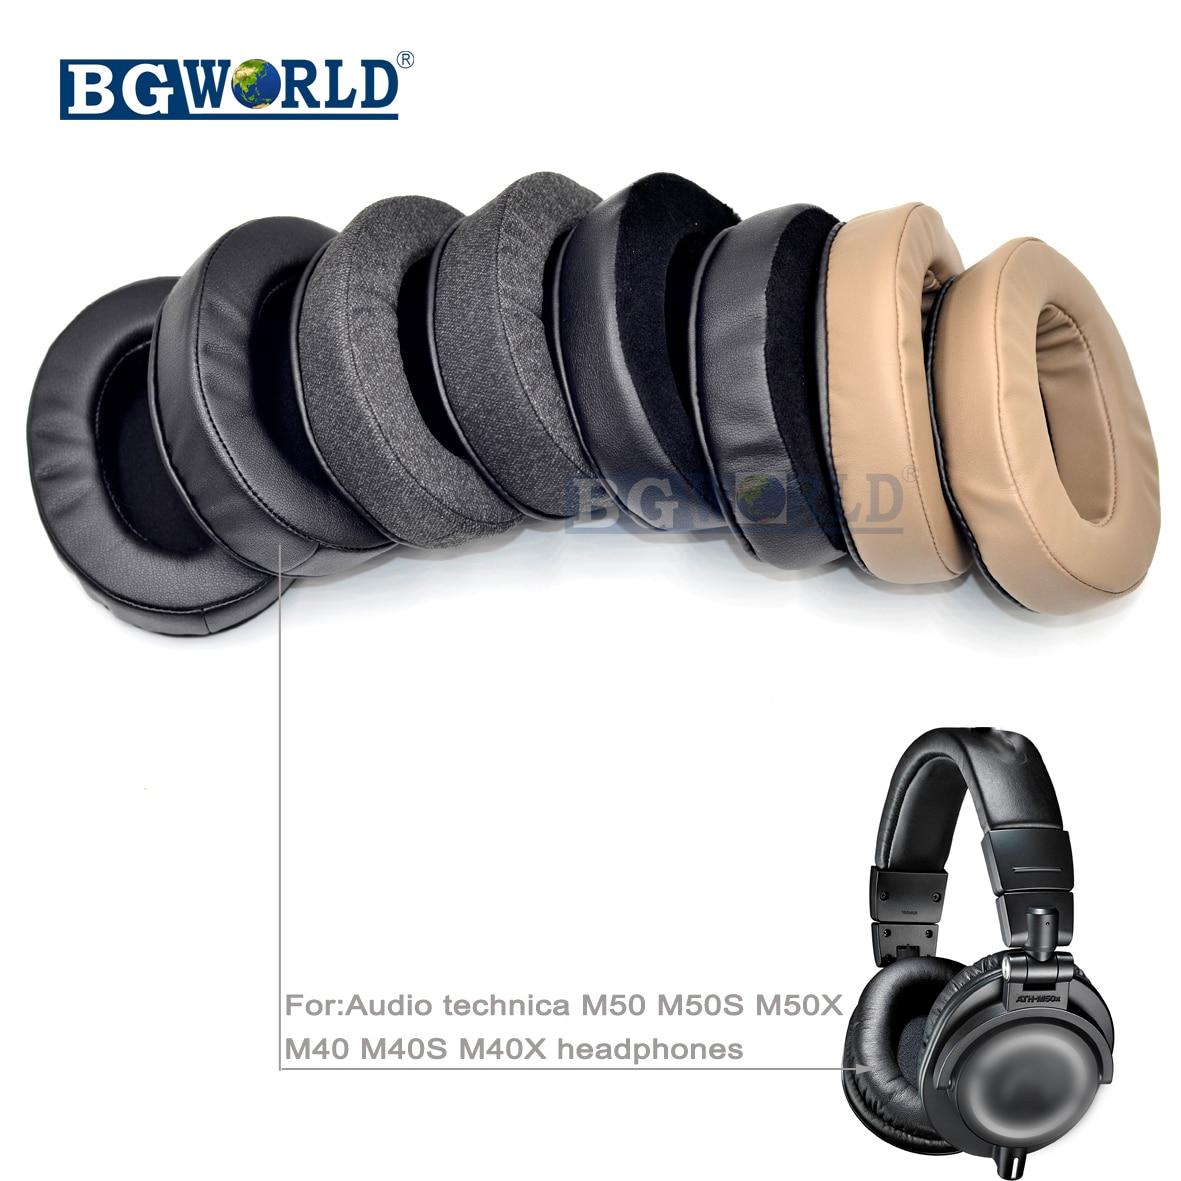 BGWORLD  Ear Pads Earpads Earmuff Cover Cushion For Audio Technica ATH M40 M50 M40X M50X M30 M35 SX1 M50S Dj Headphone Sponge